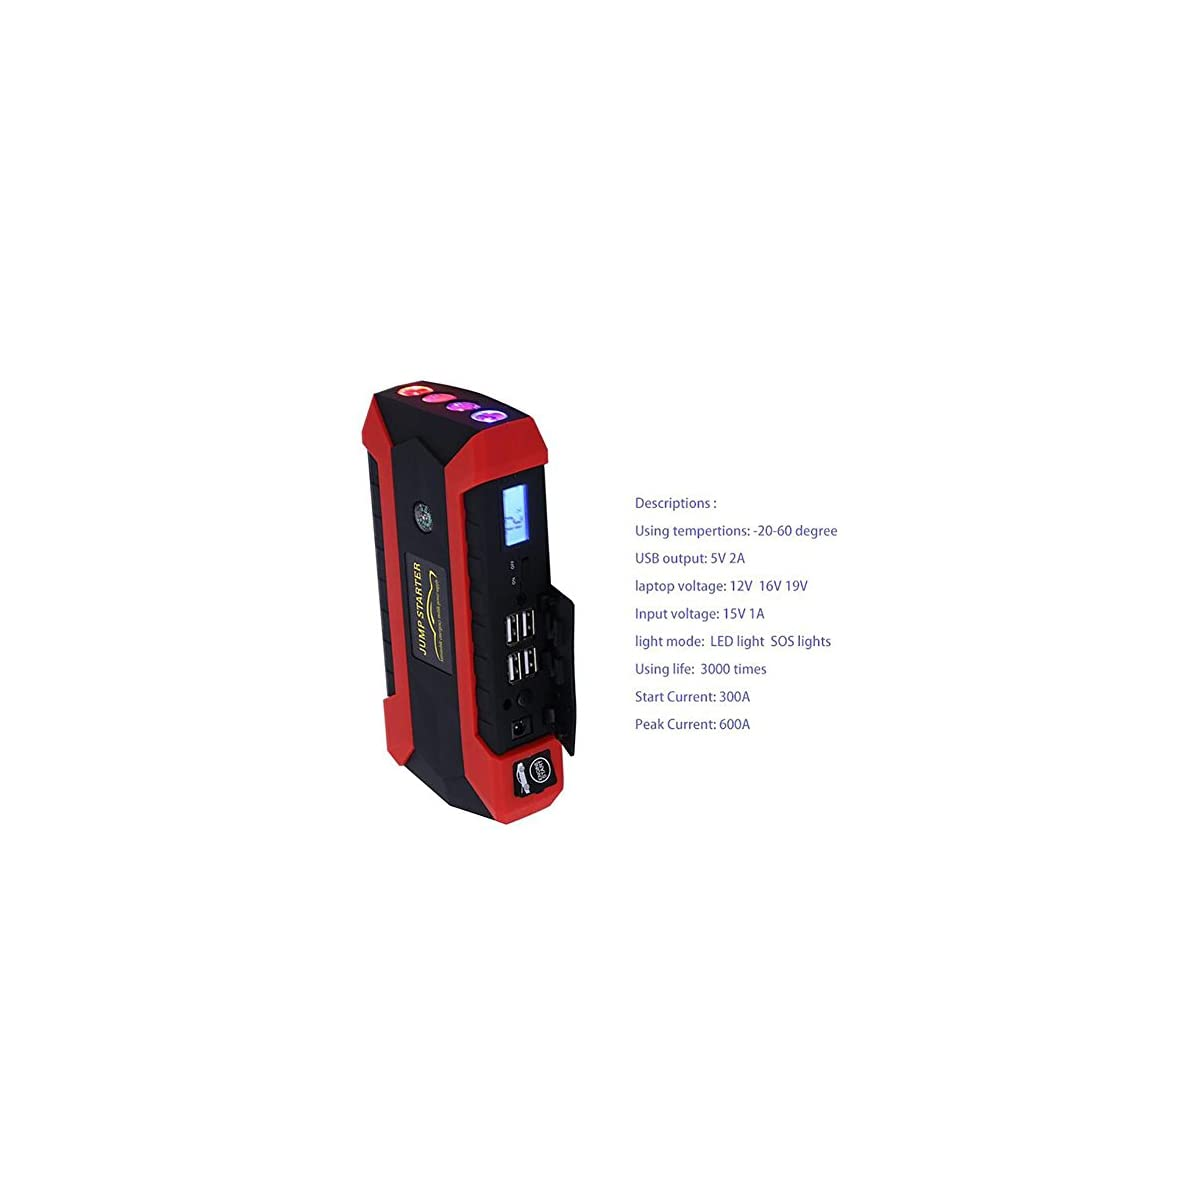 51Kh%2BCqBLtL. SS1200  - MIAO Auto Jump Starter - Coche de la gasolina / Diesel Car Universal Emergency Start Power Supply, 12V / 1A Lithium Battery, Multi-Function Car LED Linterna Mobile Power